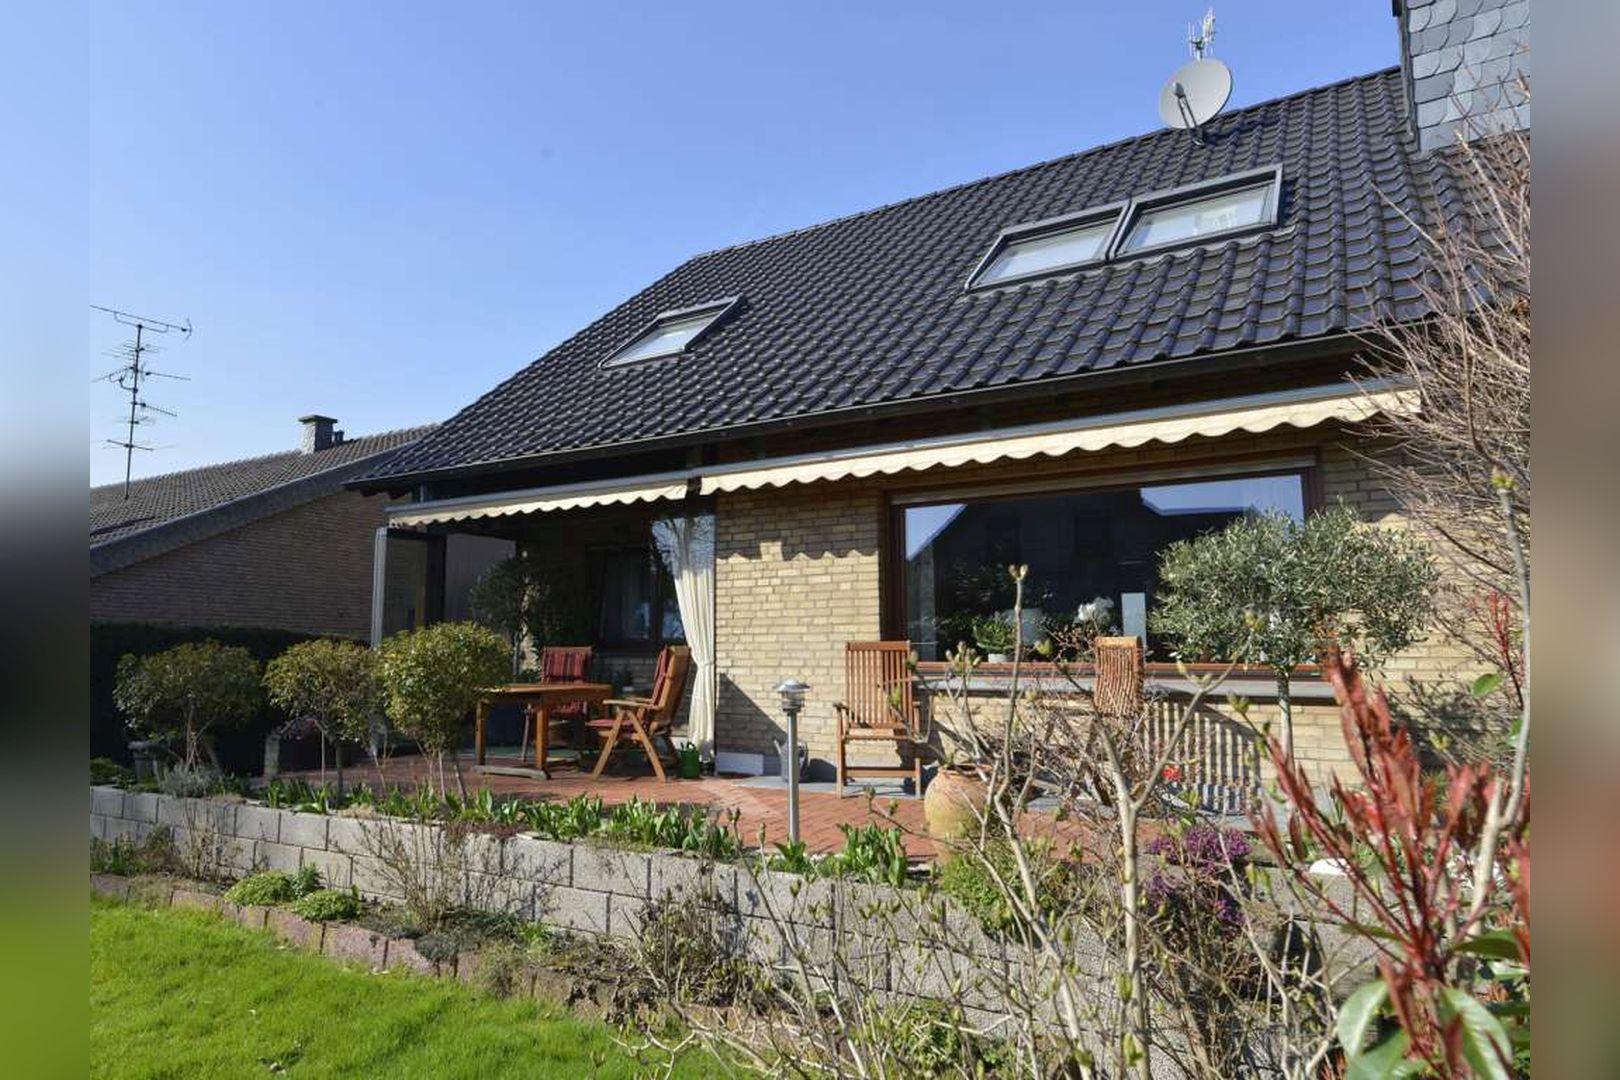 Immobilie Nr.0254 - Doppelhaushälfte rechtsbündig mit Garage & Carport  - Bild 3.jpg